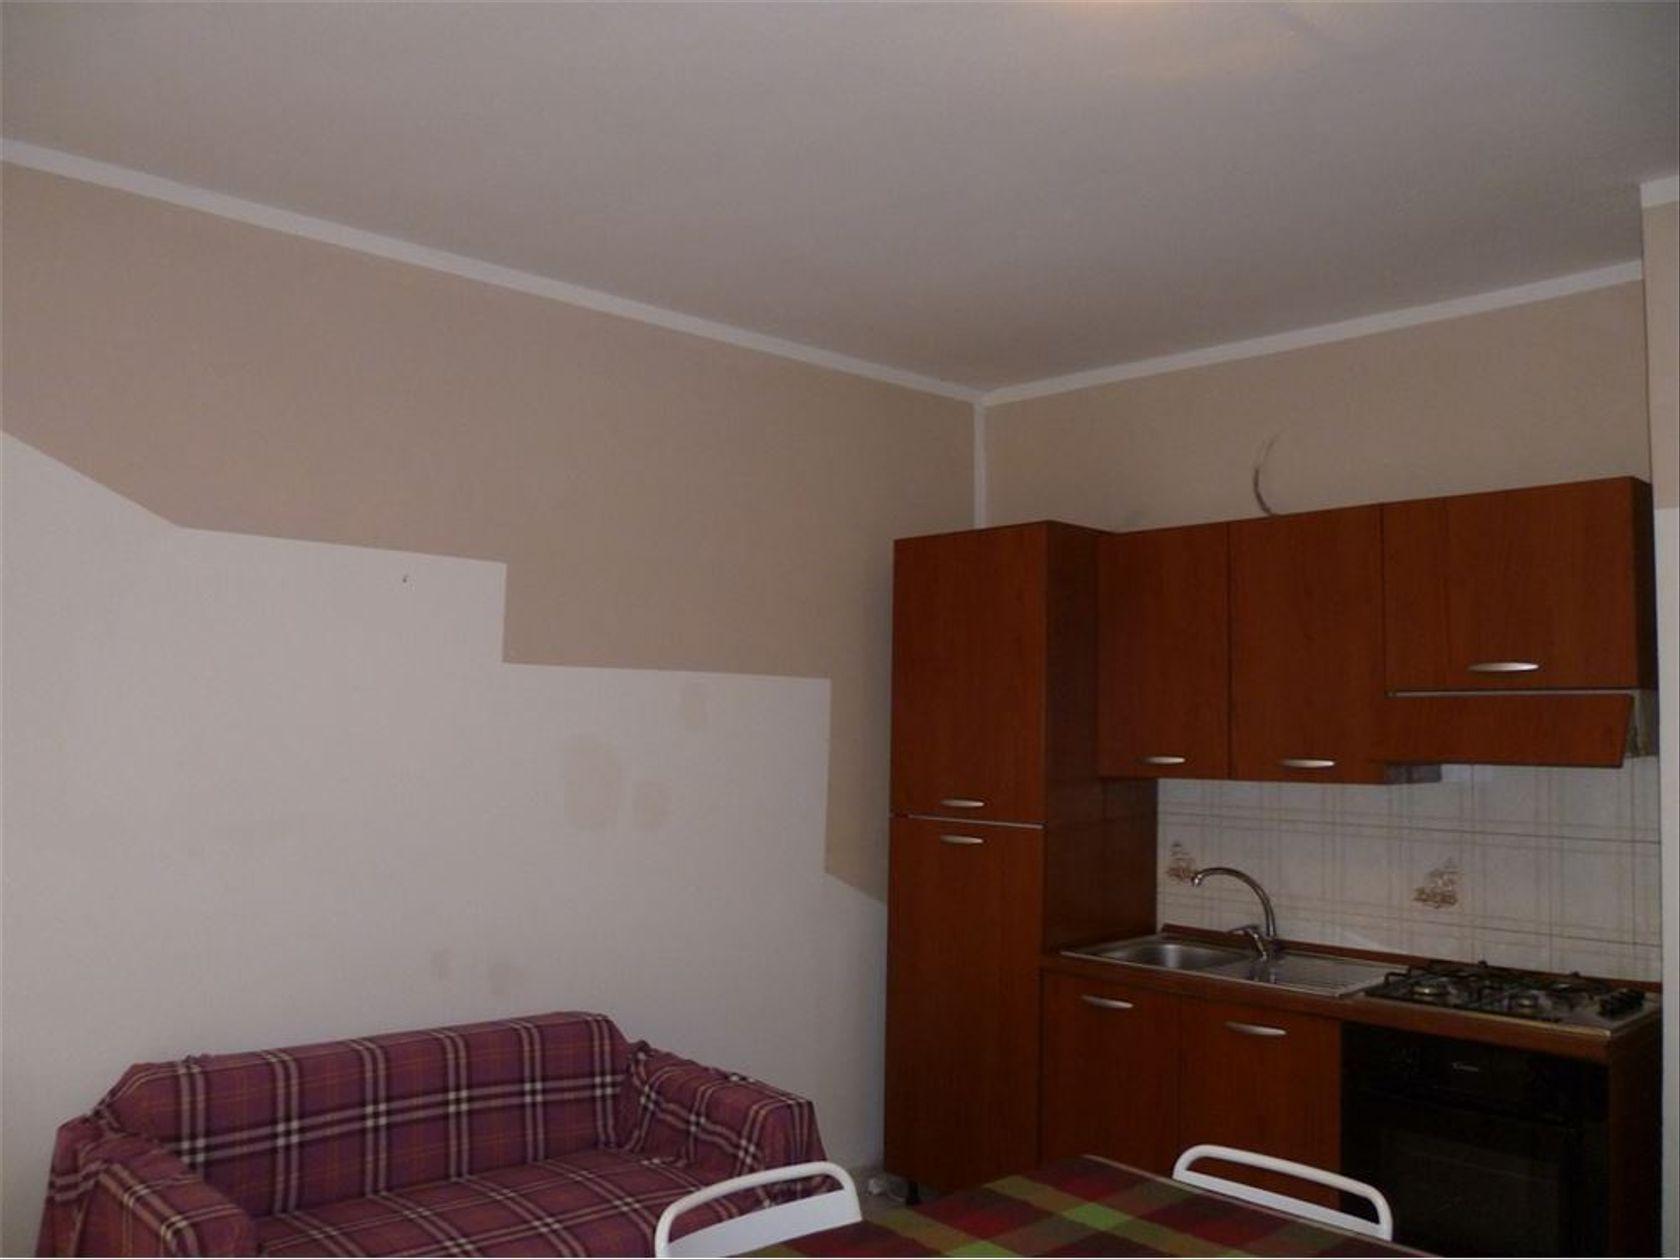 Appartamento Fossacesia Marina, Fossacesia, CH Vendita - Foto 3